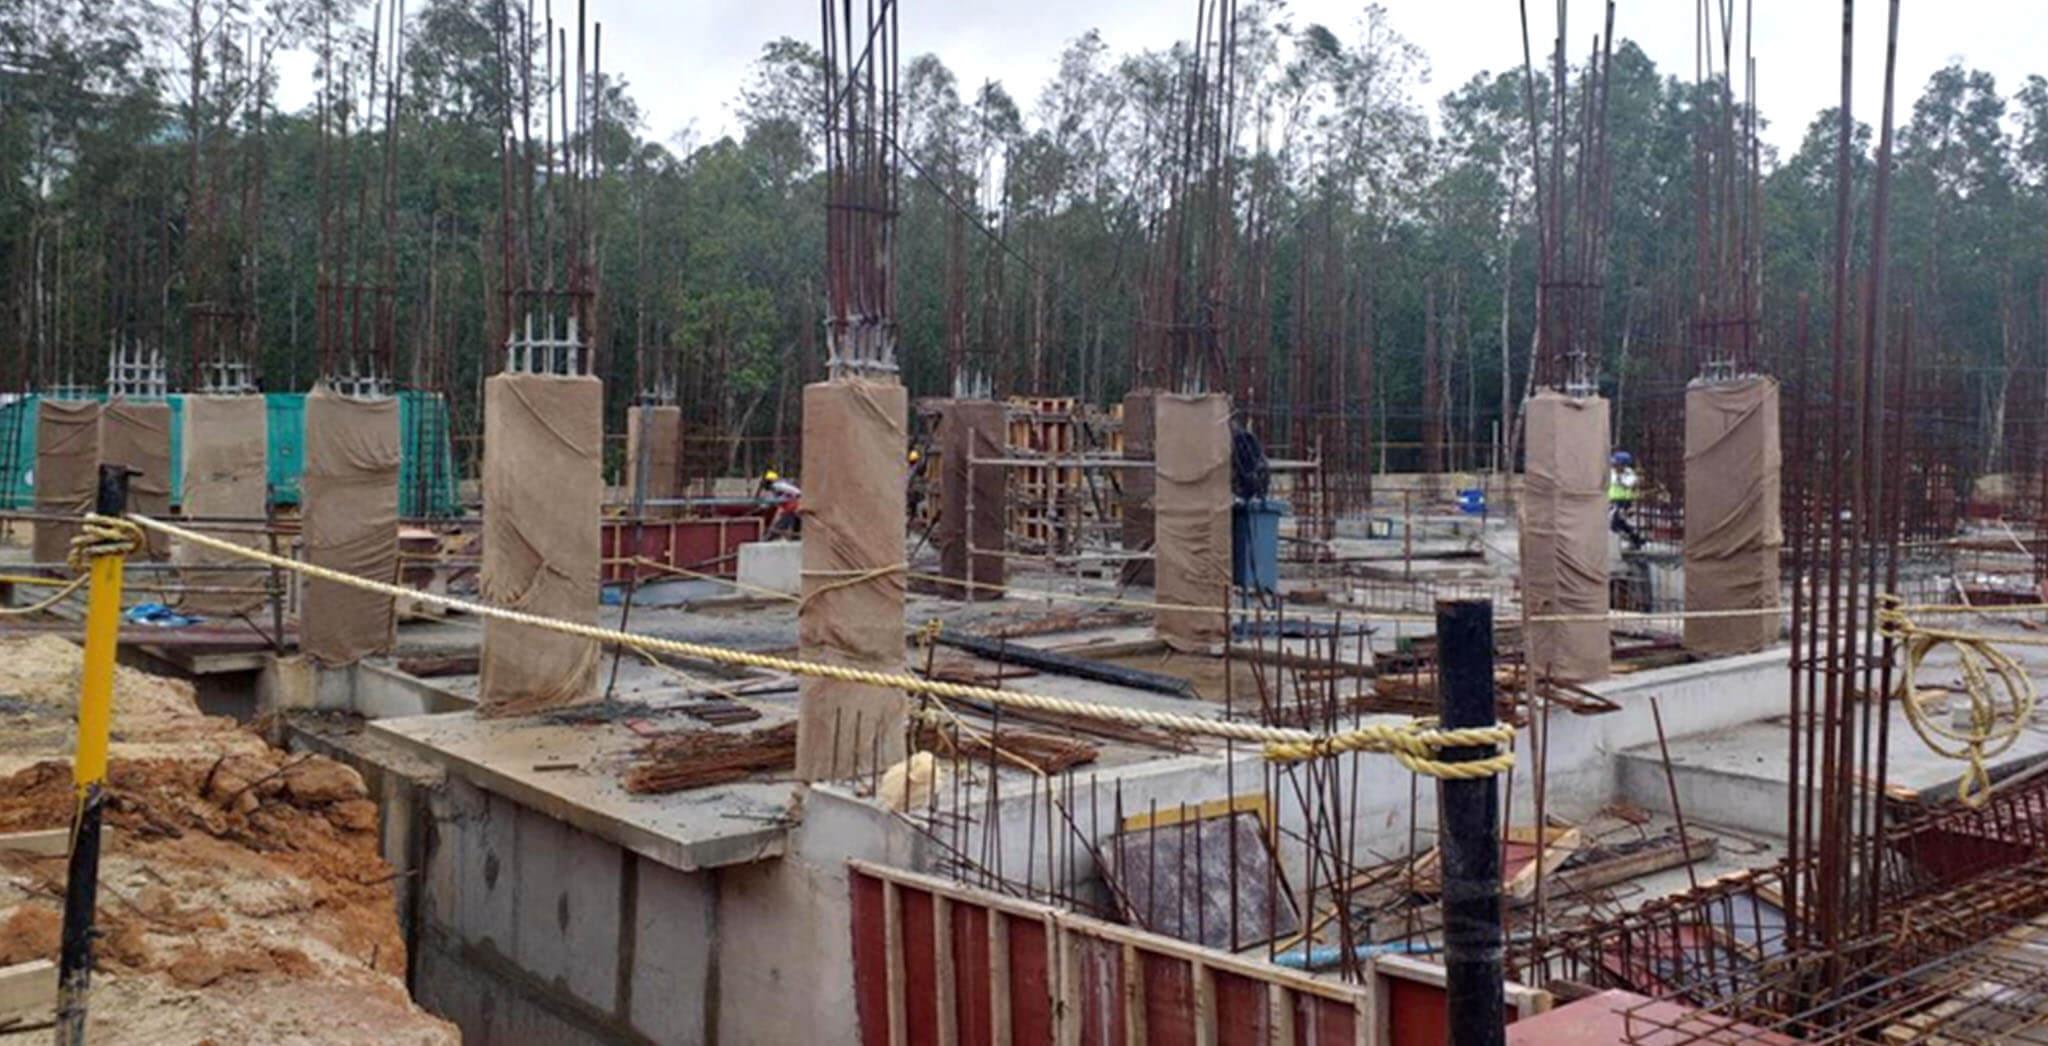 Aug 2019 - West side view: L Block ground floor slab completed • L Block ground floor columns under progress